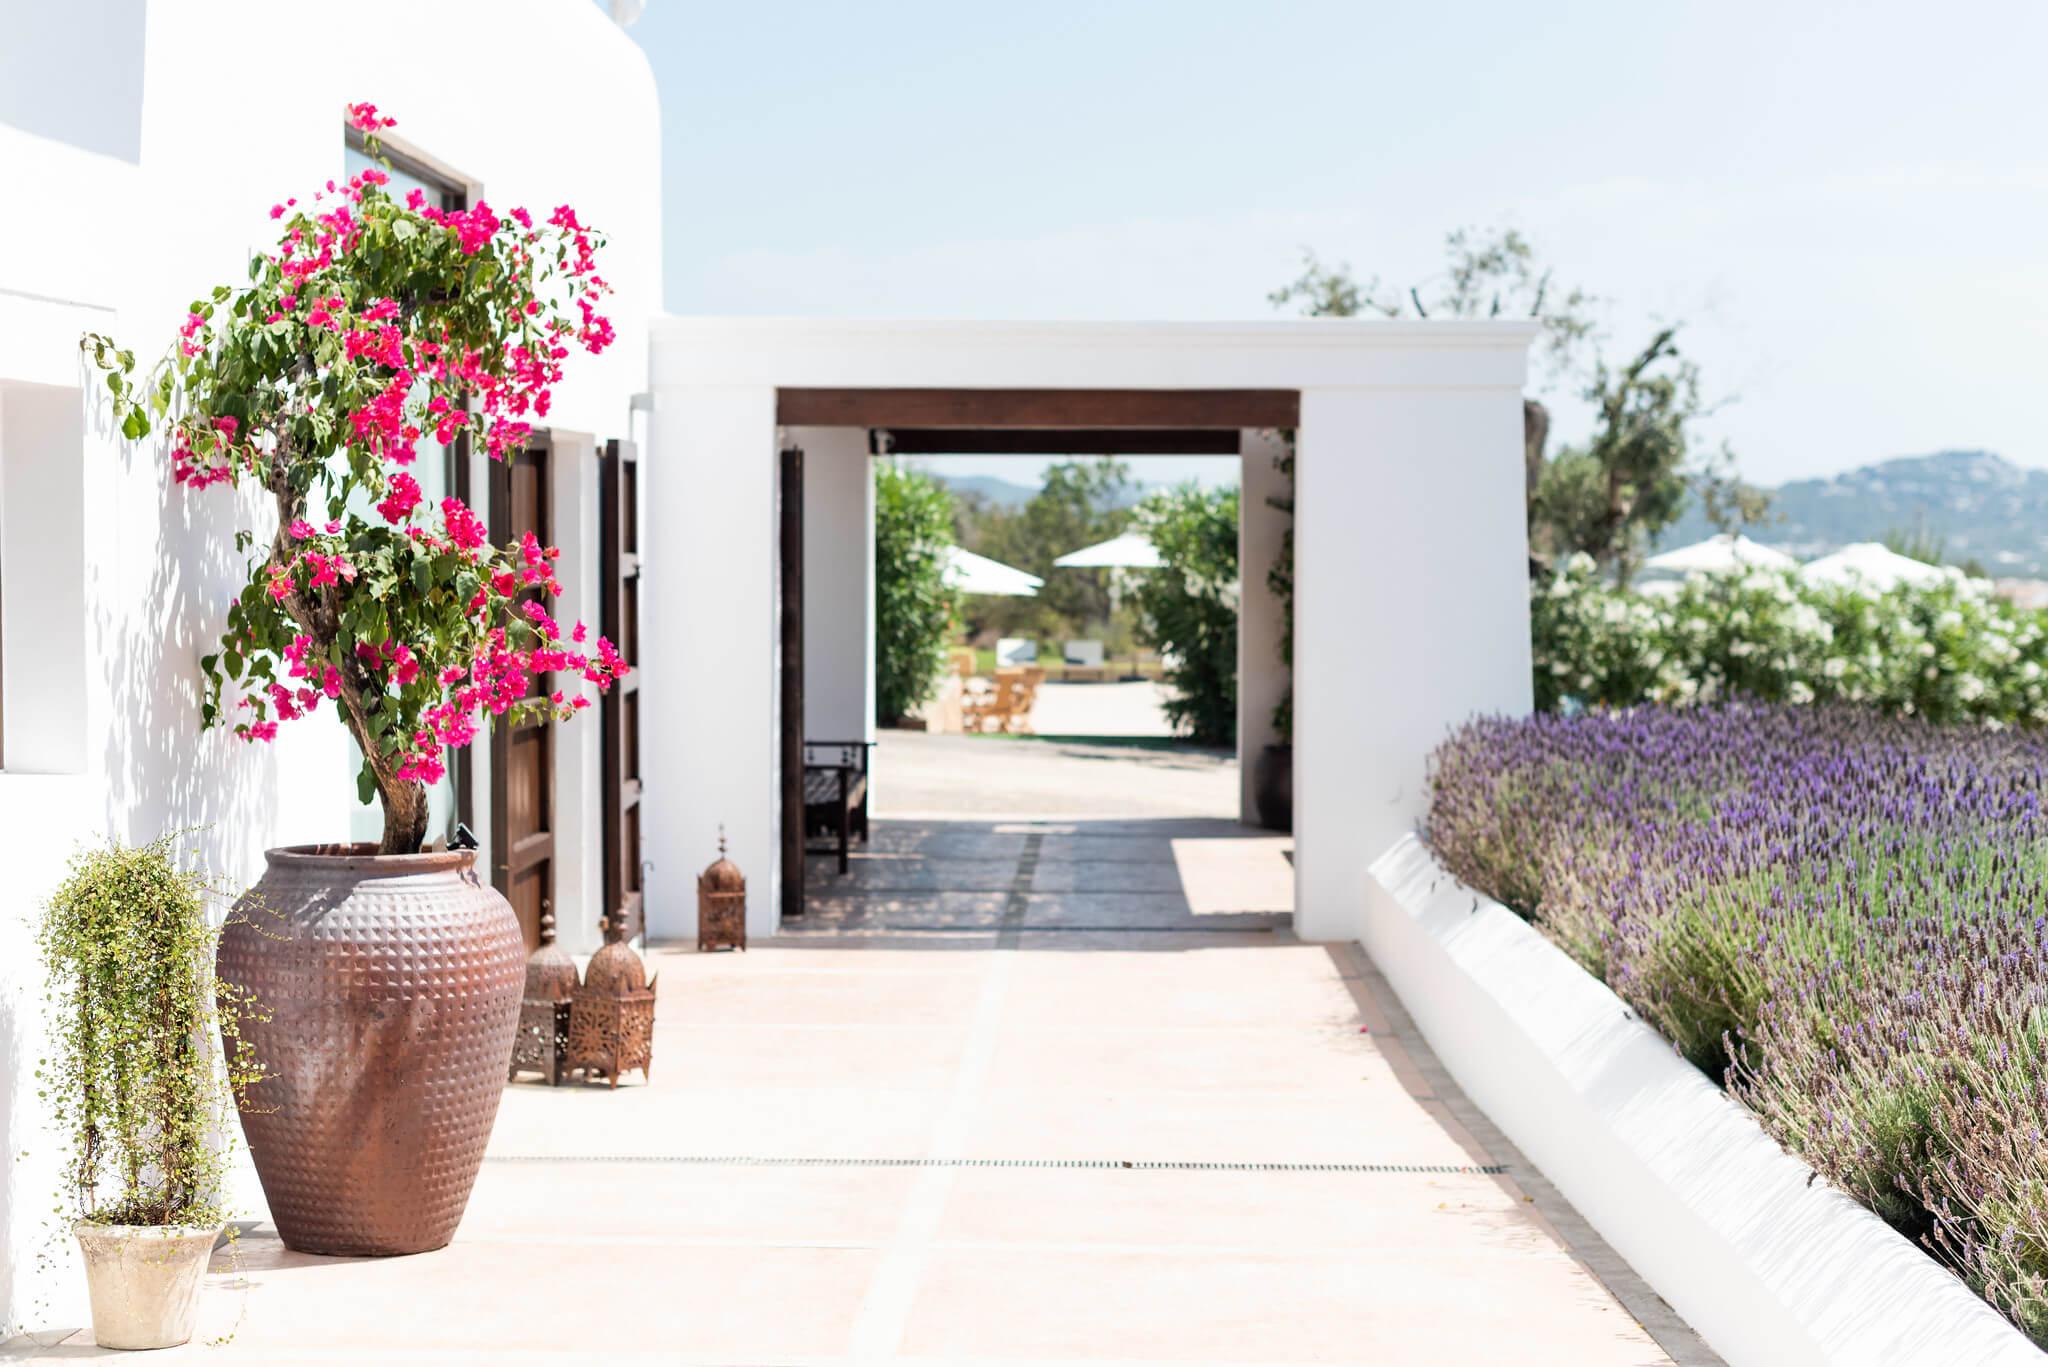 https://www.white-ibiza.com/wp-content/uploads/2020/03/white-ibiza-boutique-hotels-casa-maca-2020-03.jpg